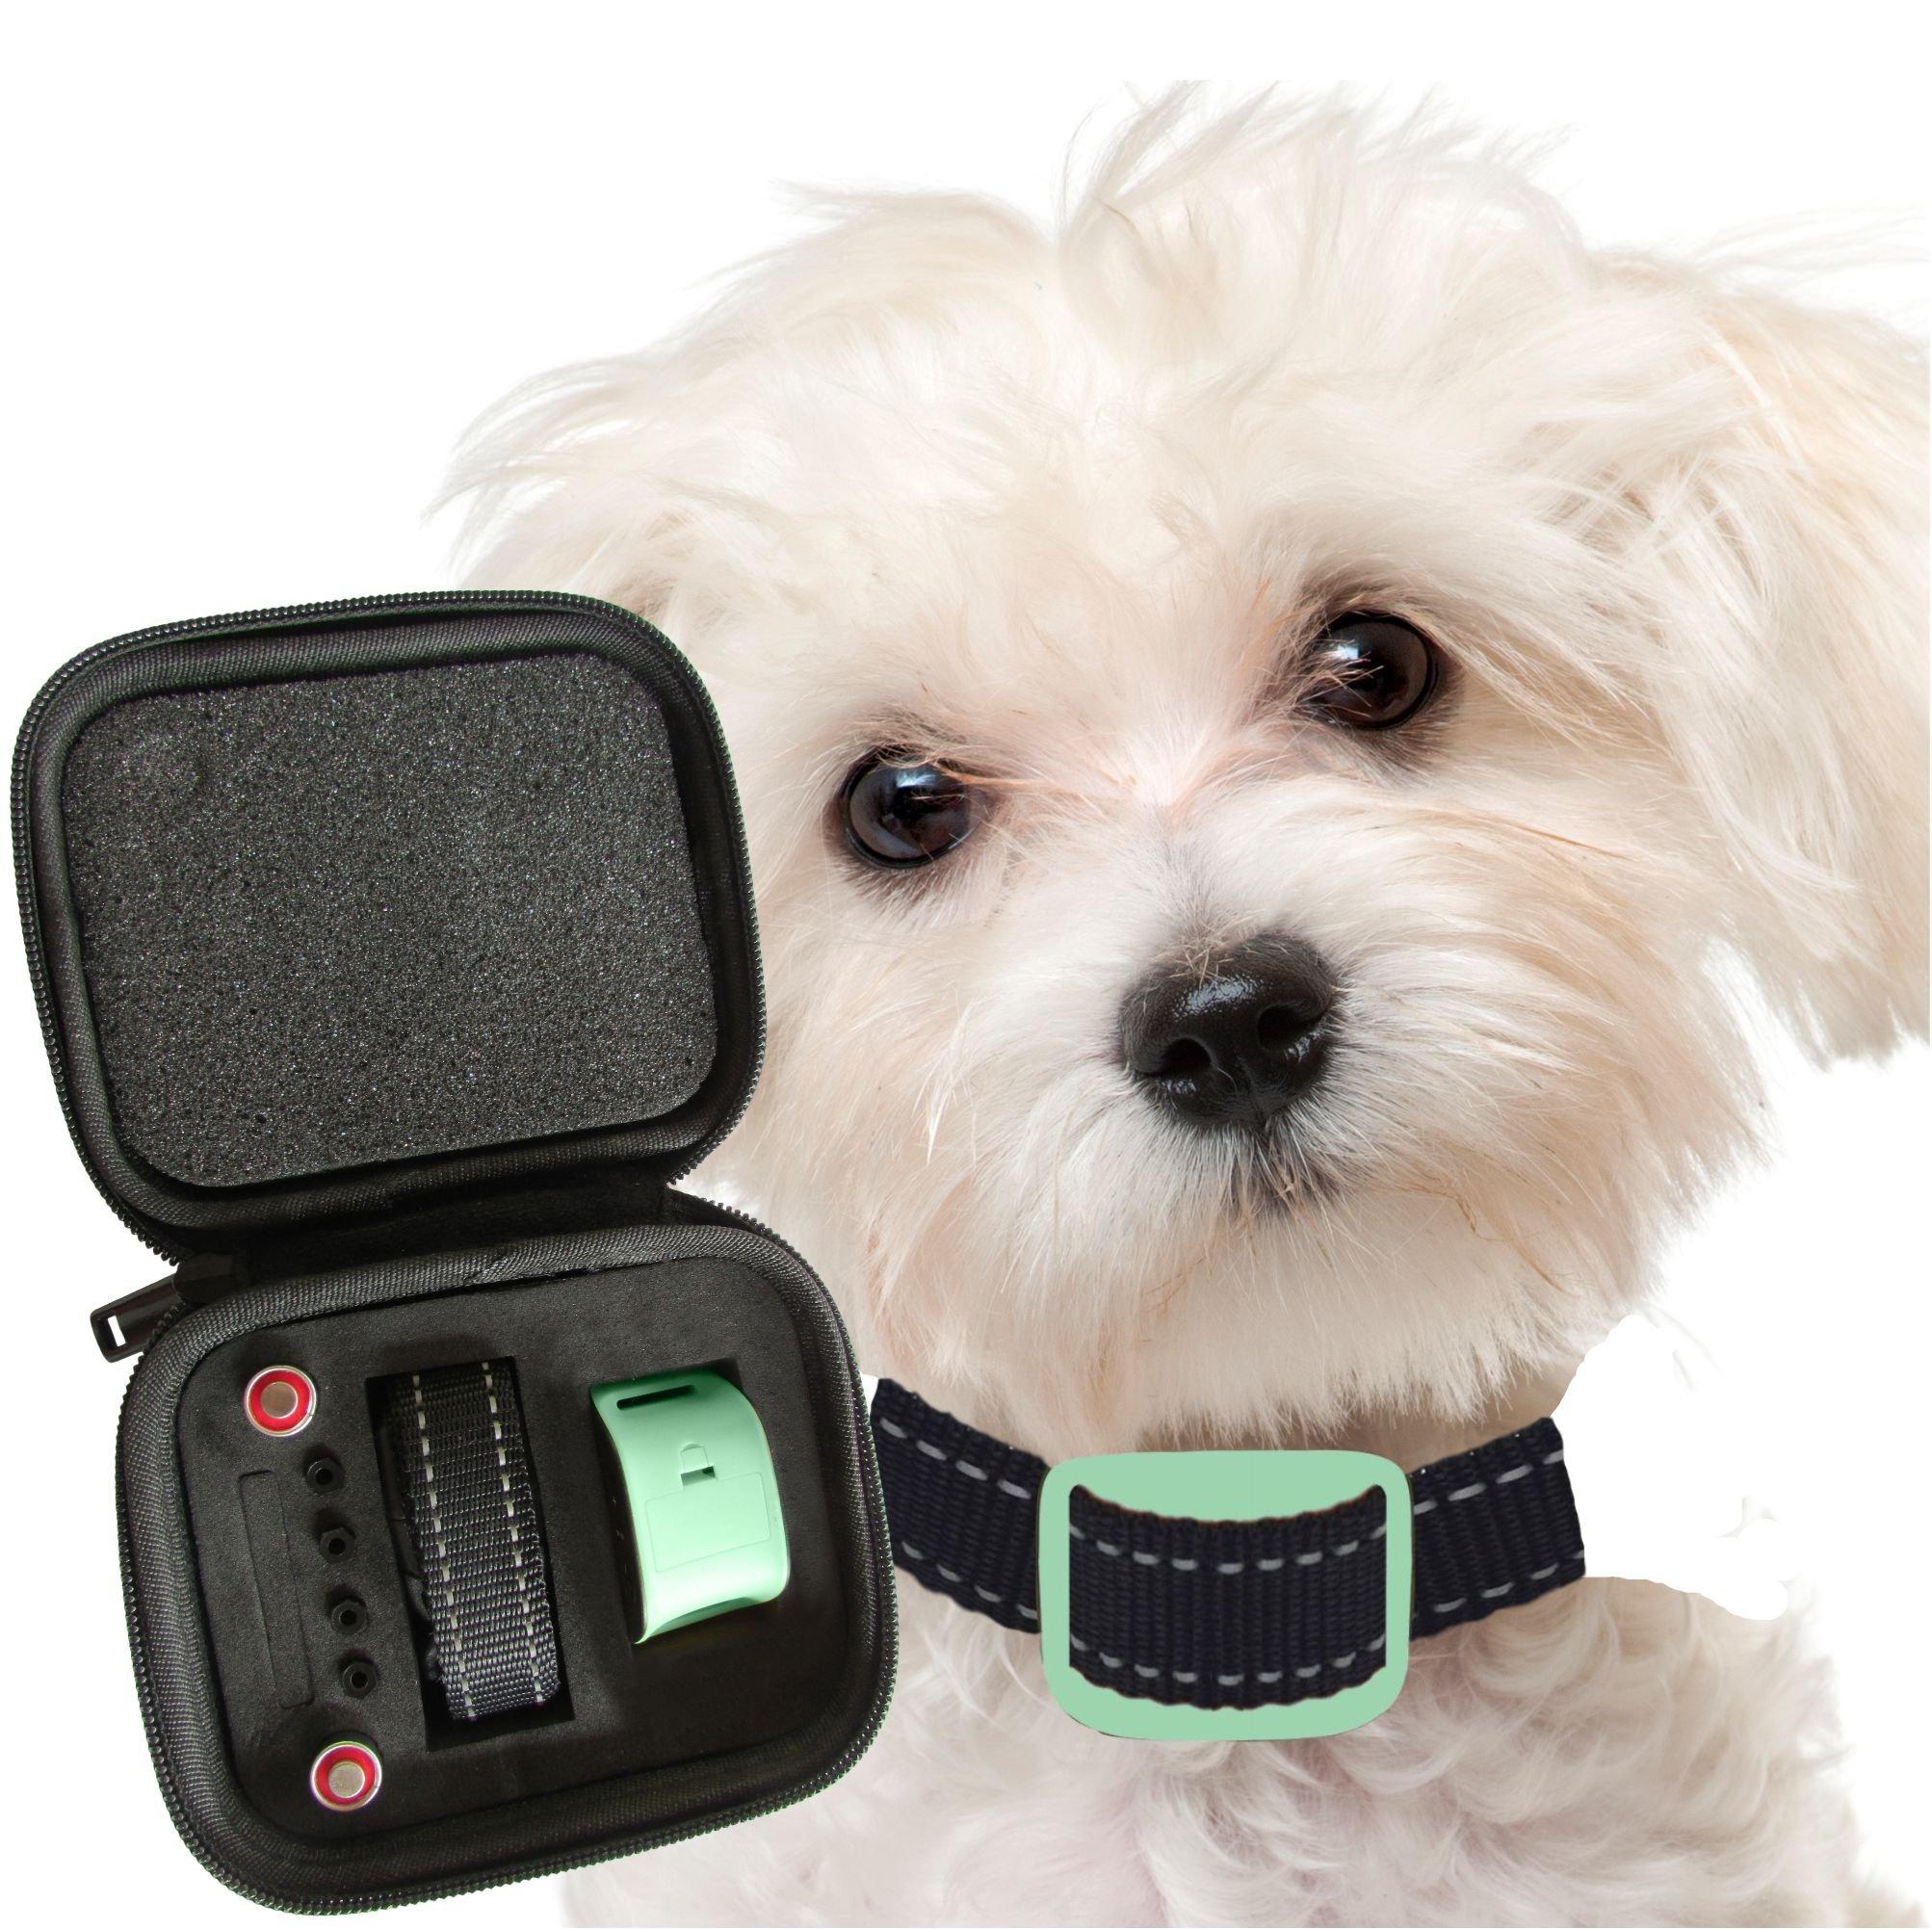 Our K9 Mint Bark Collar. Toy Breed No Bark Collar & Small Dog Anti-Bark Colla.. 18